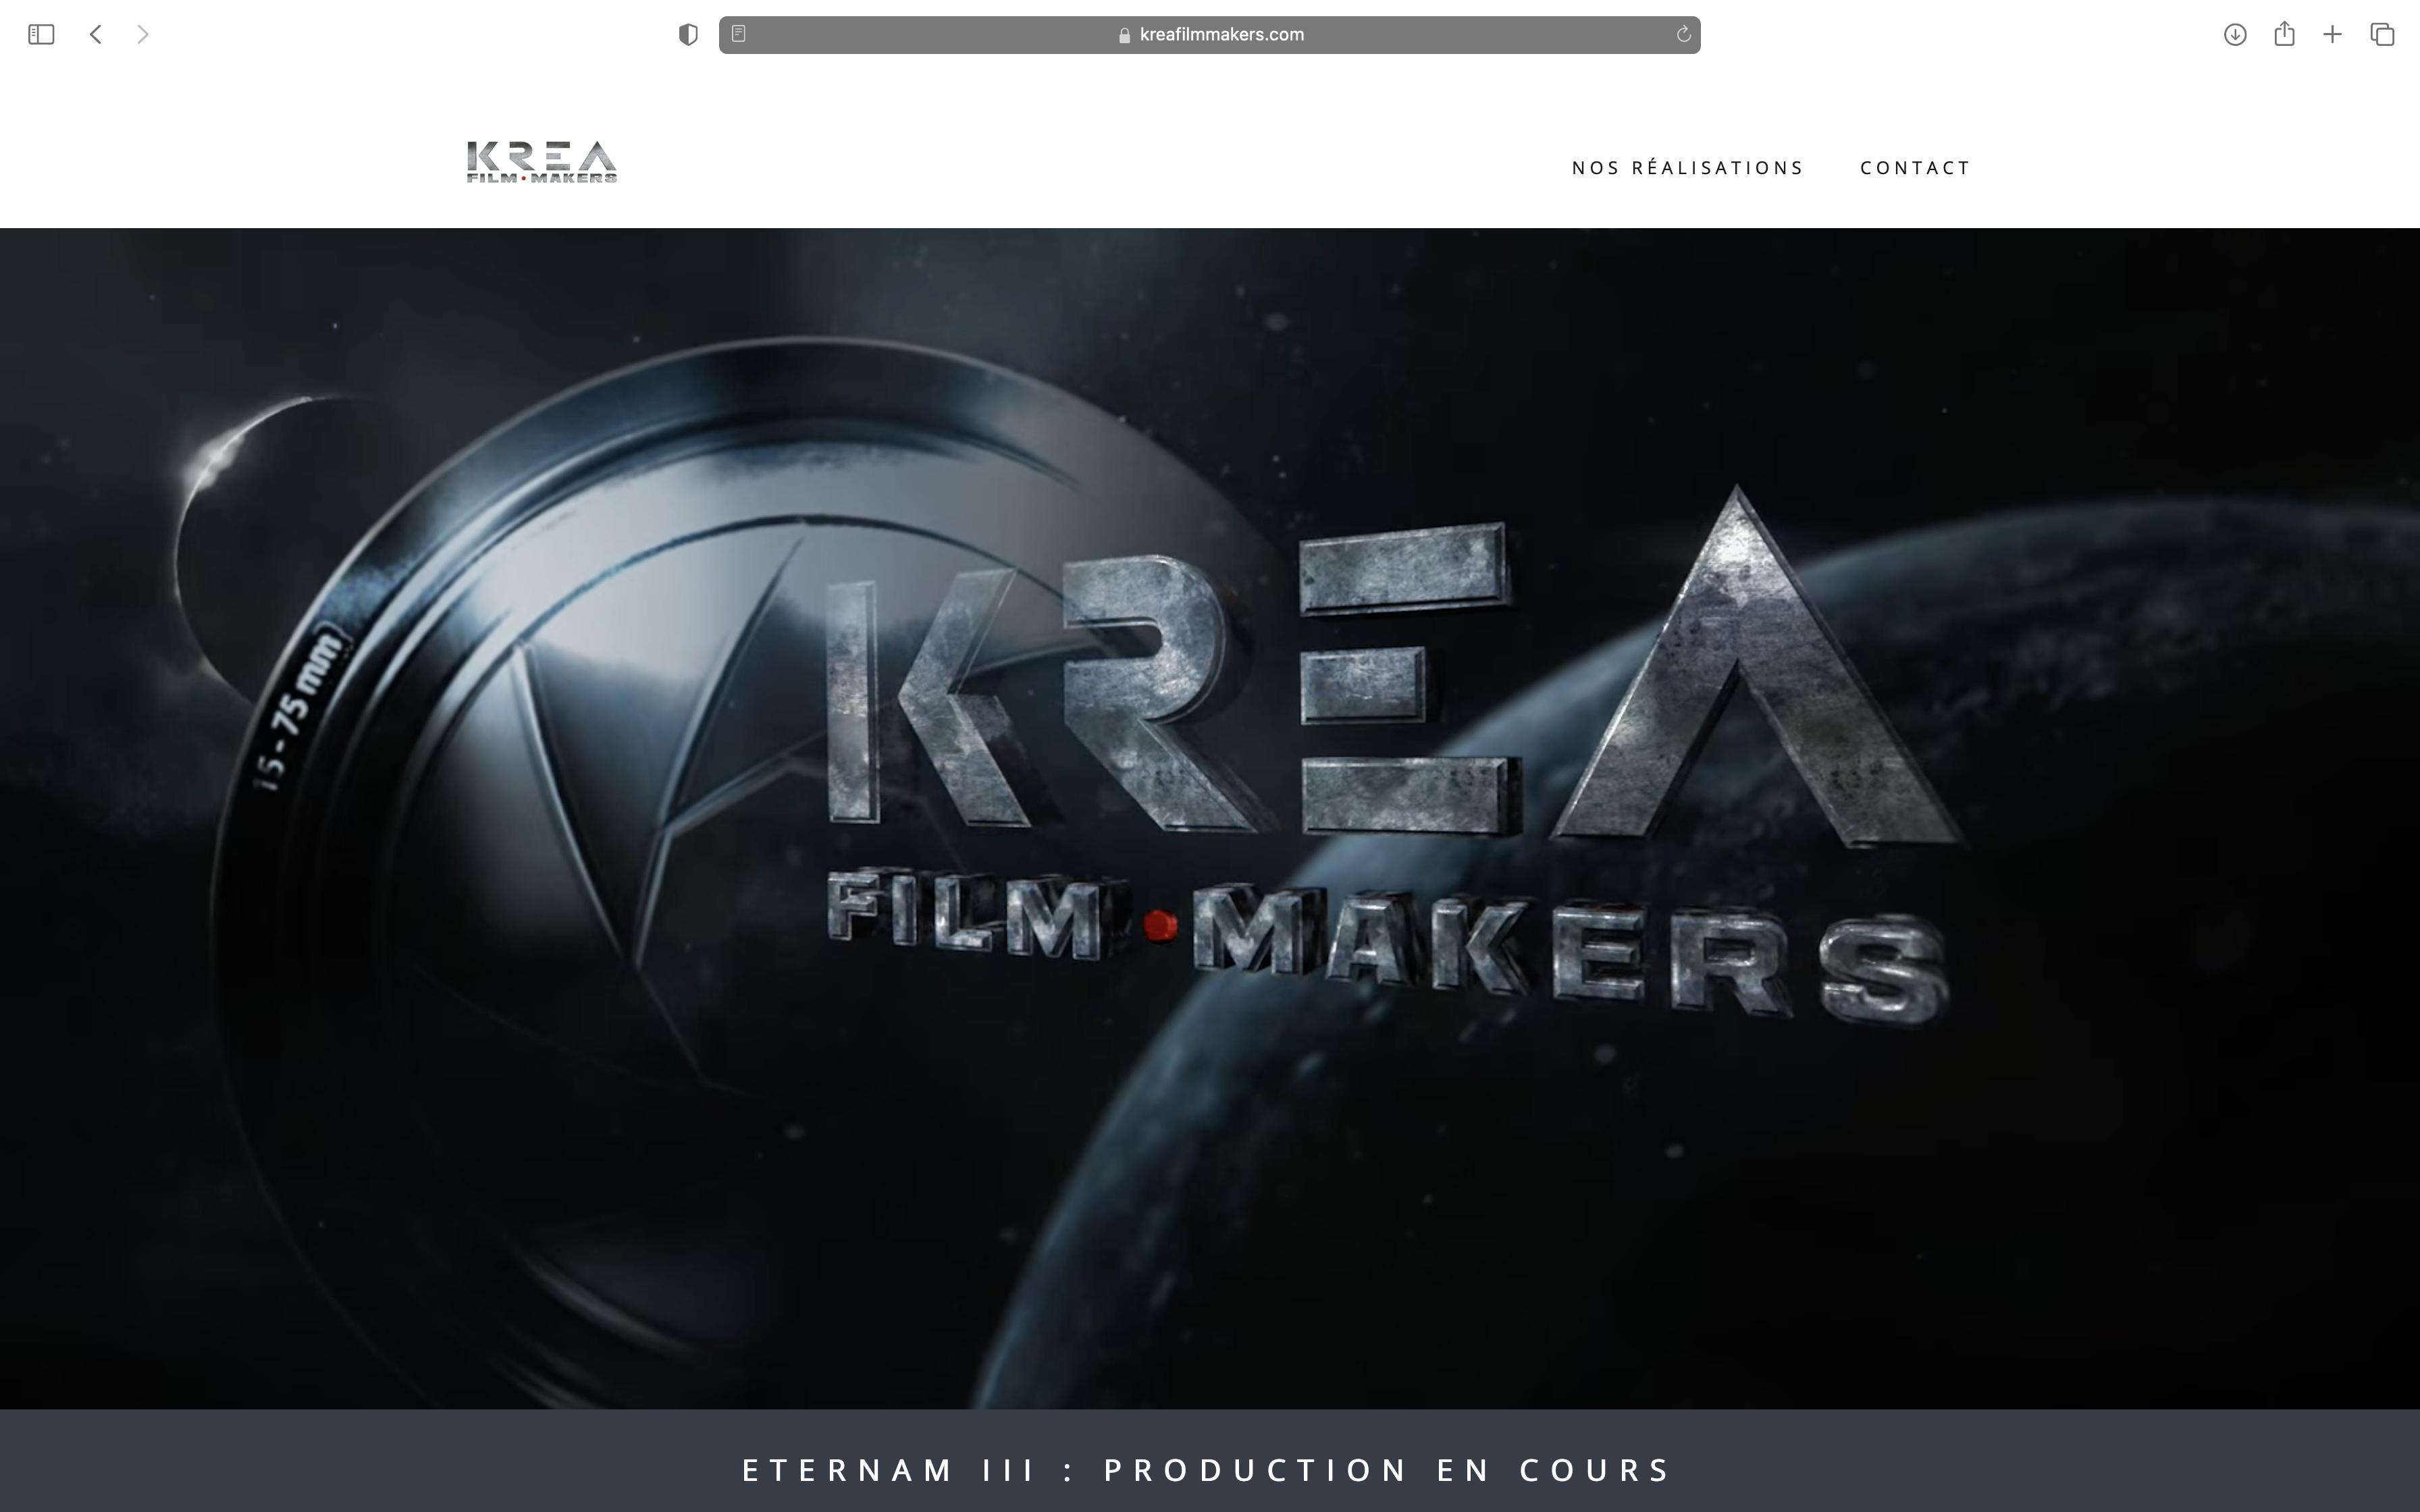 KREA FILM-MAKERS